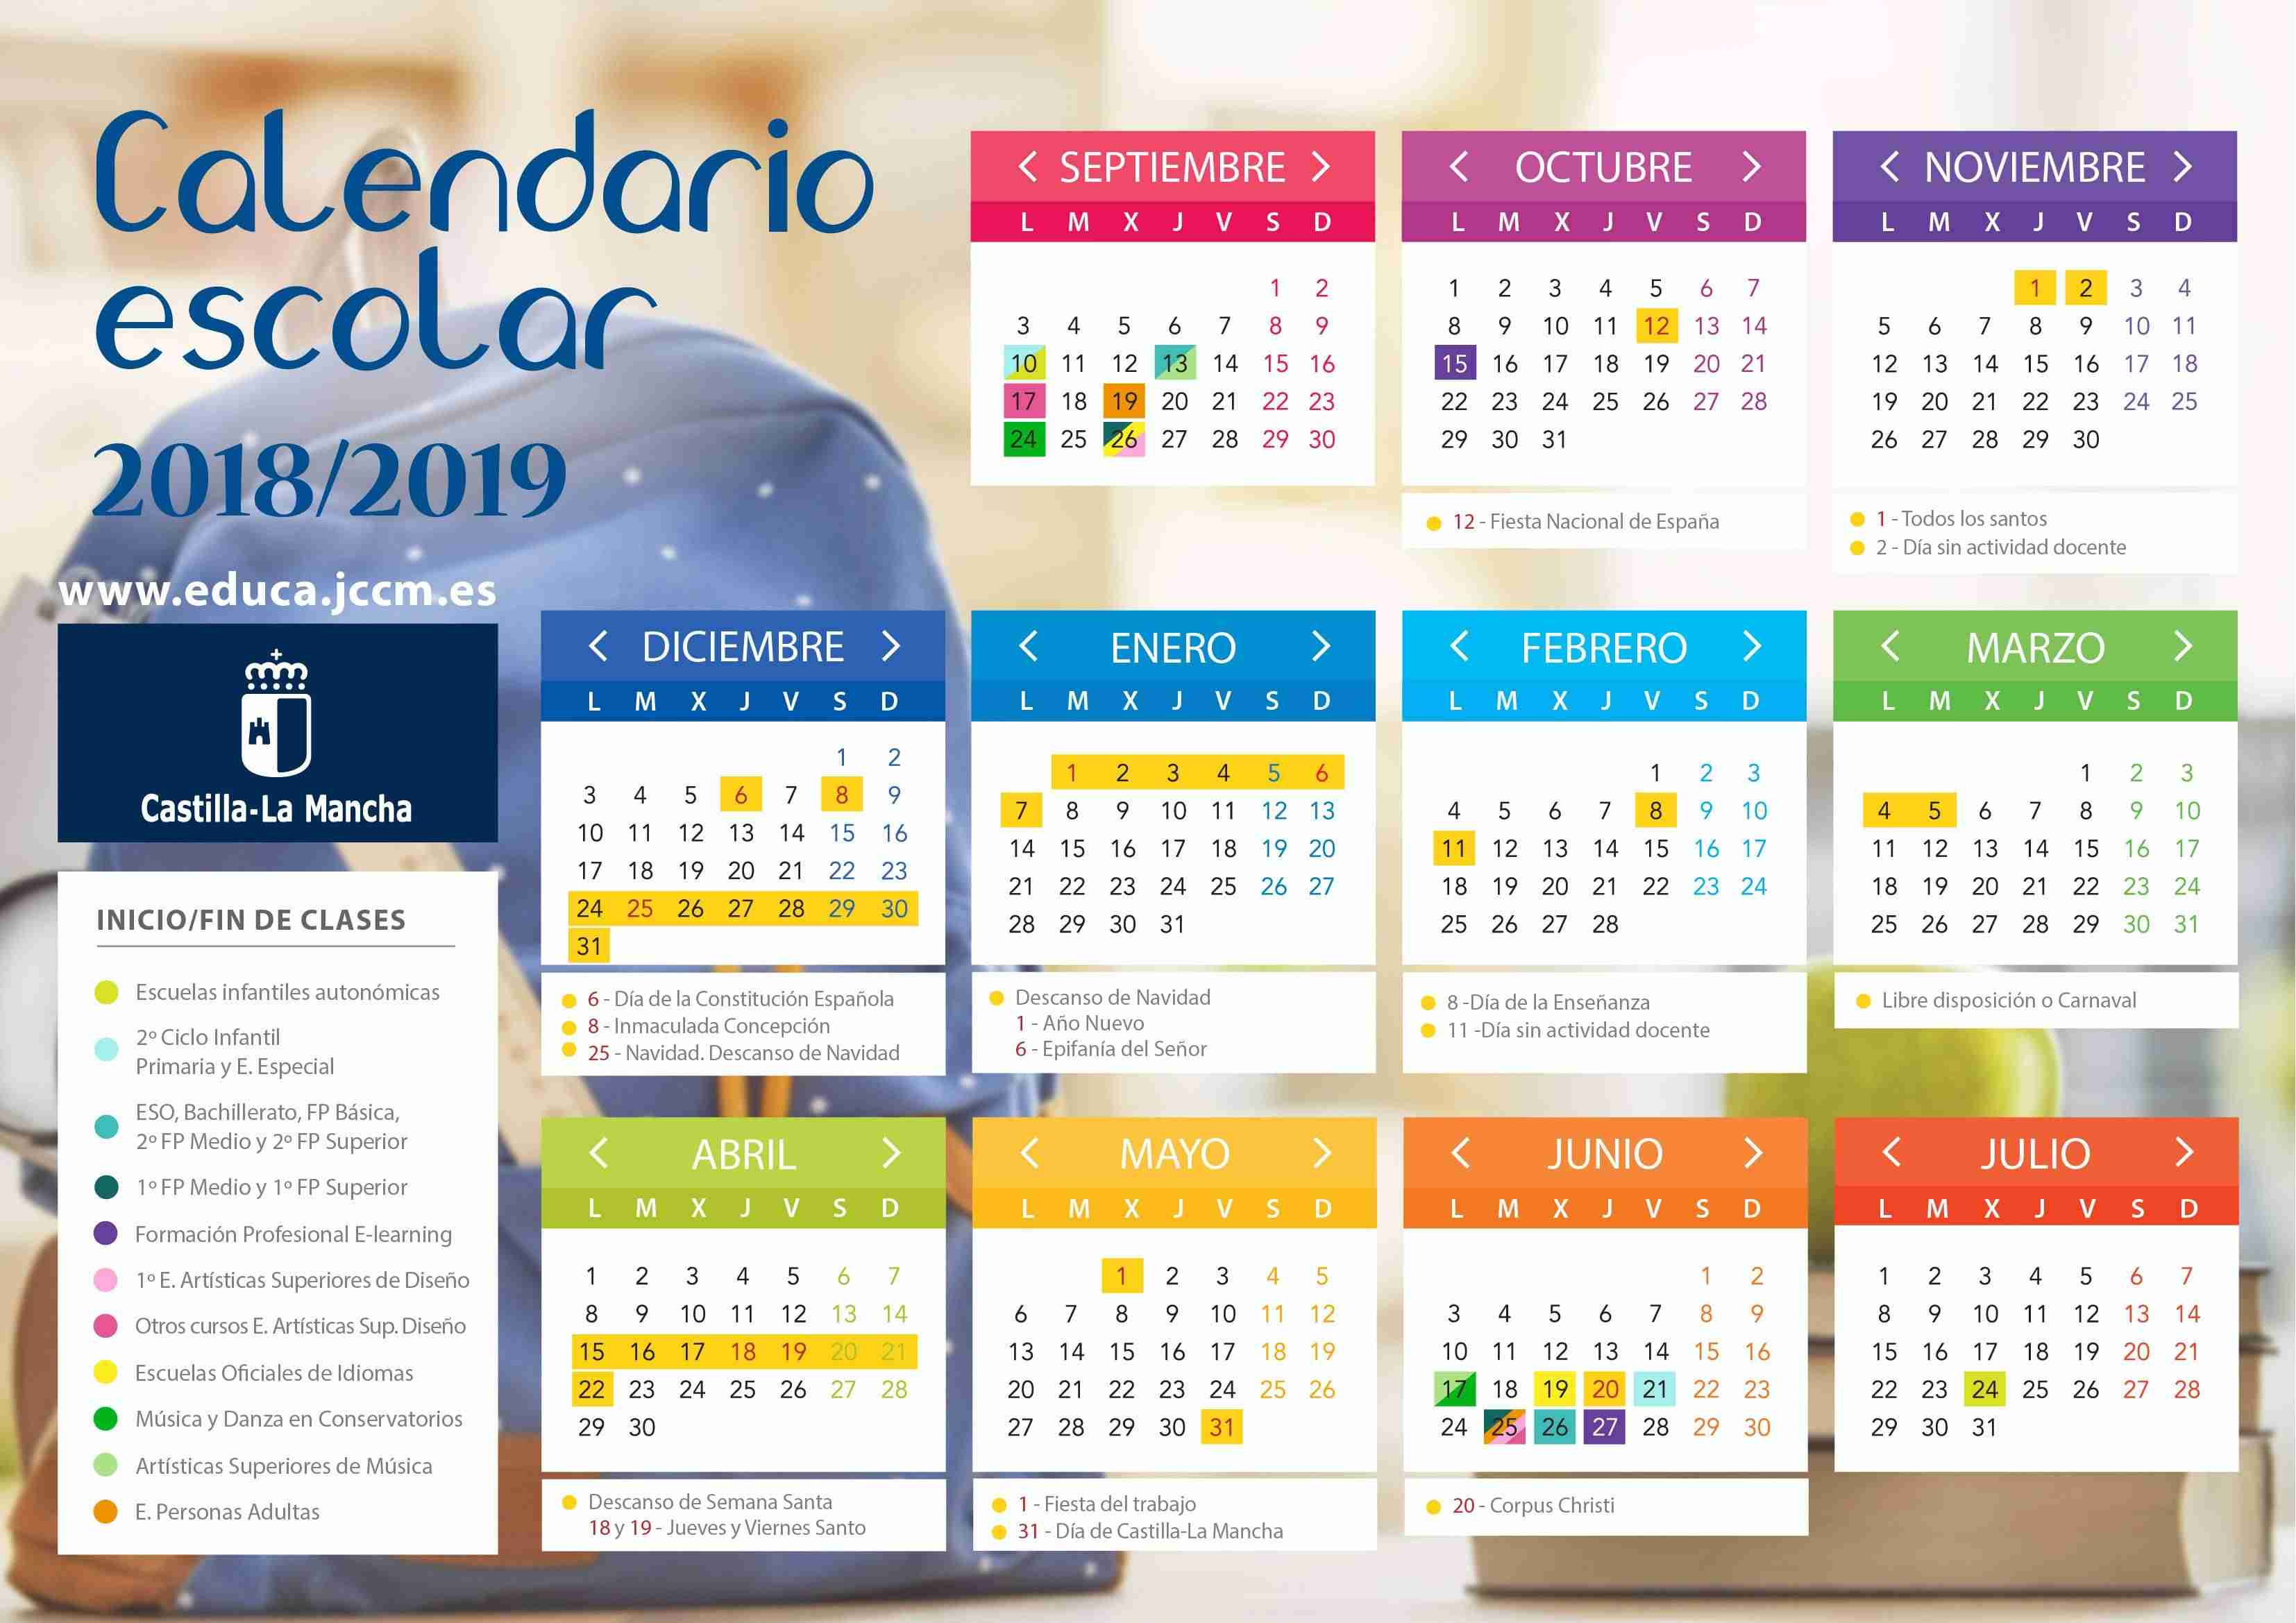 Calendario Escolar 2019 Madrid.Calendario Escolar 2019 2020 Madrid Numeracao Oficial Para A Copa